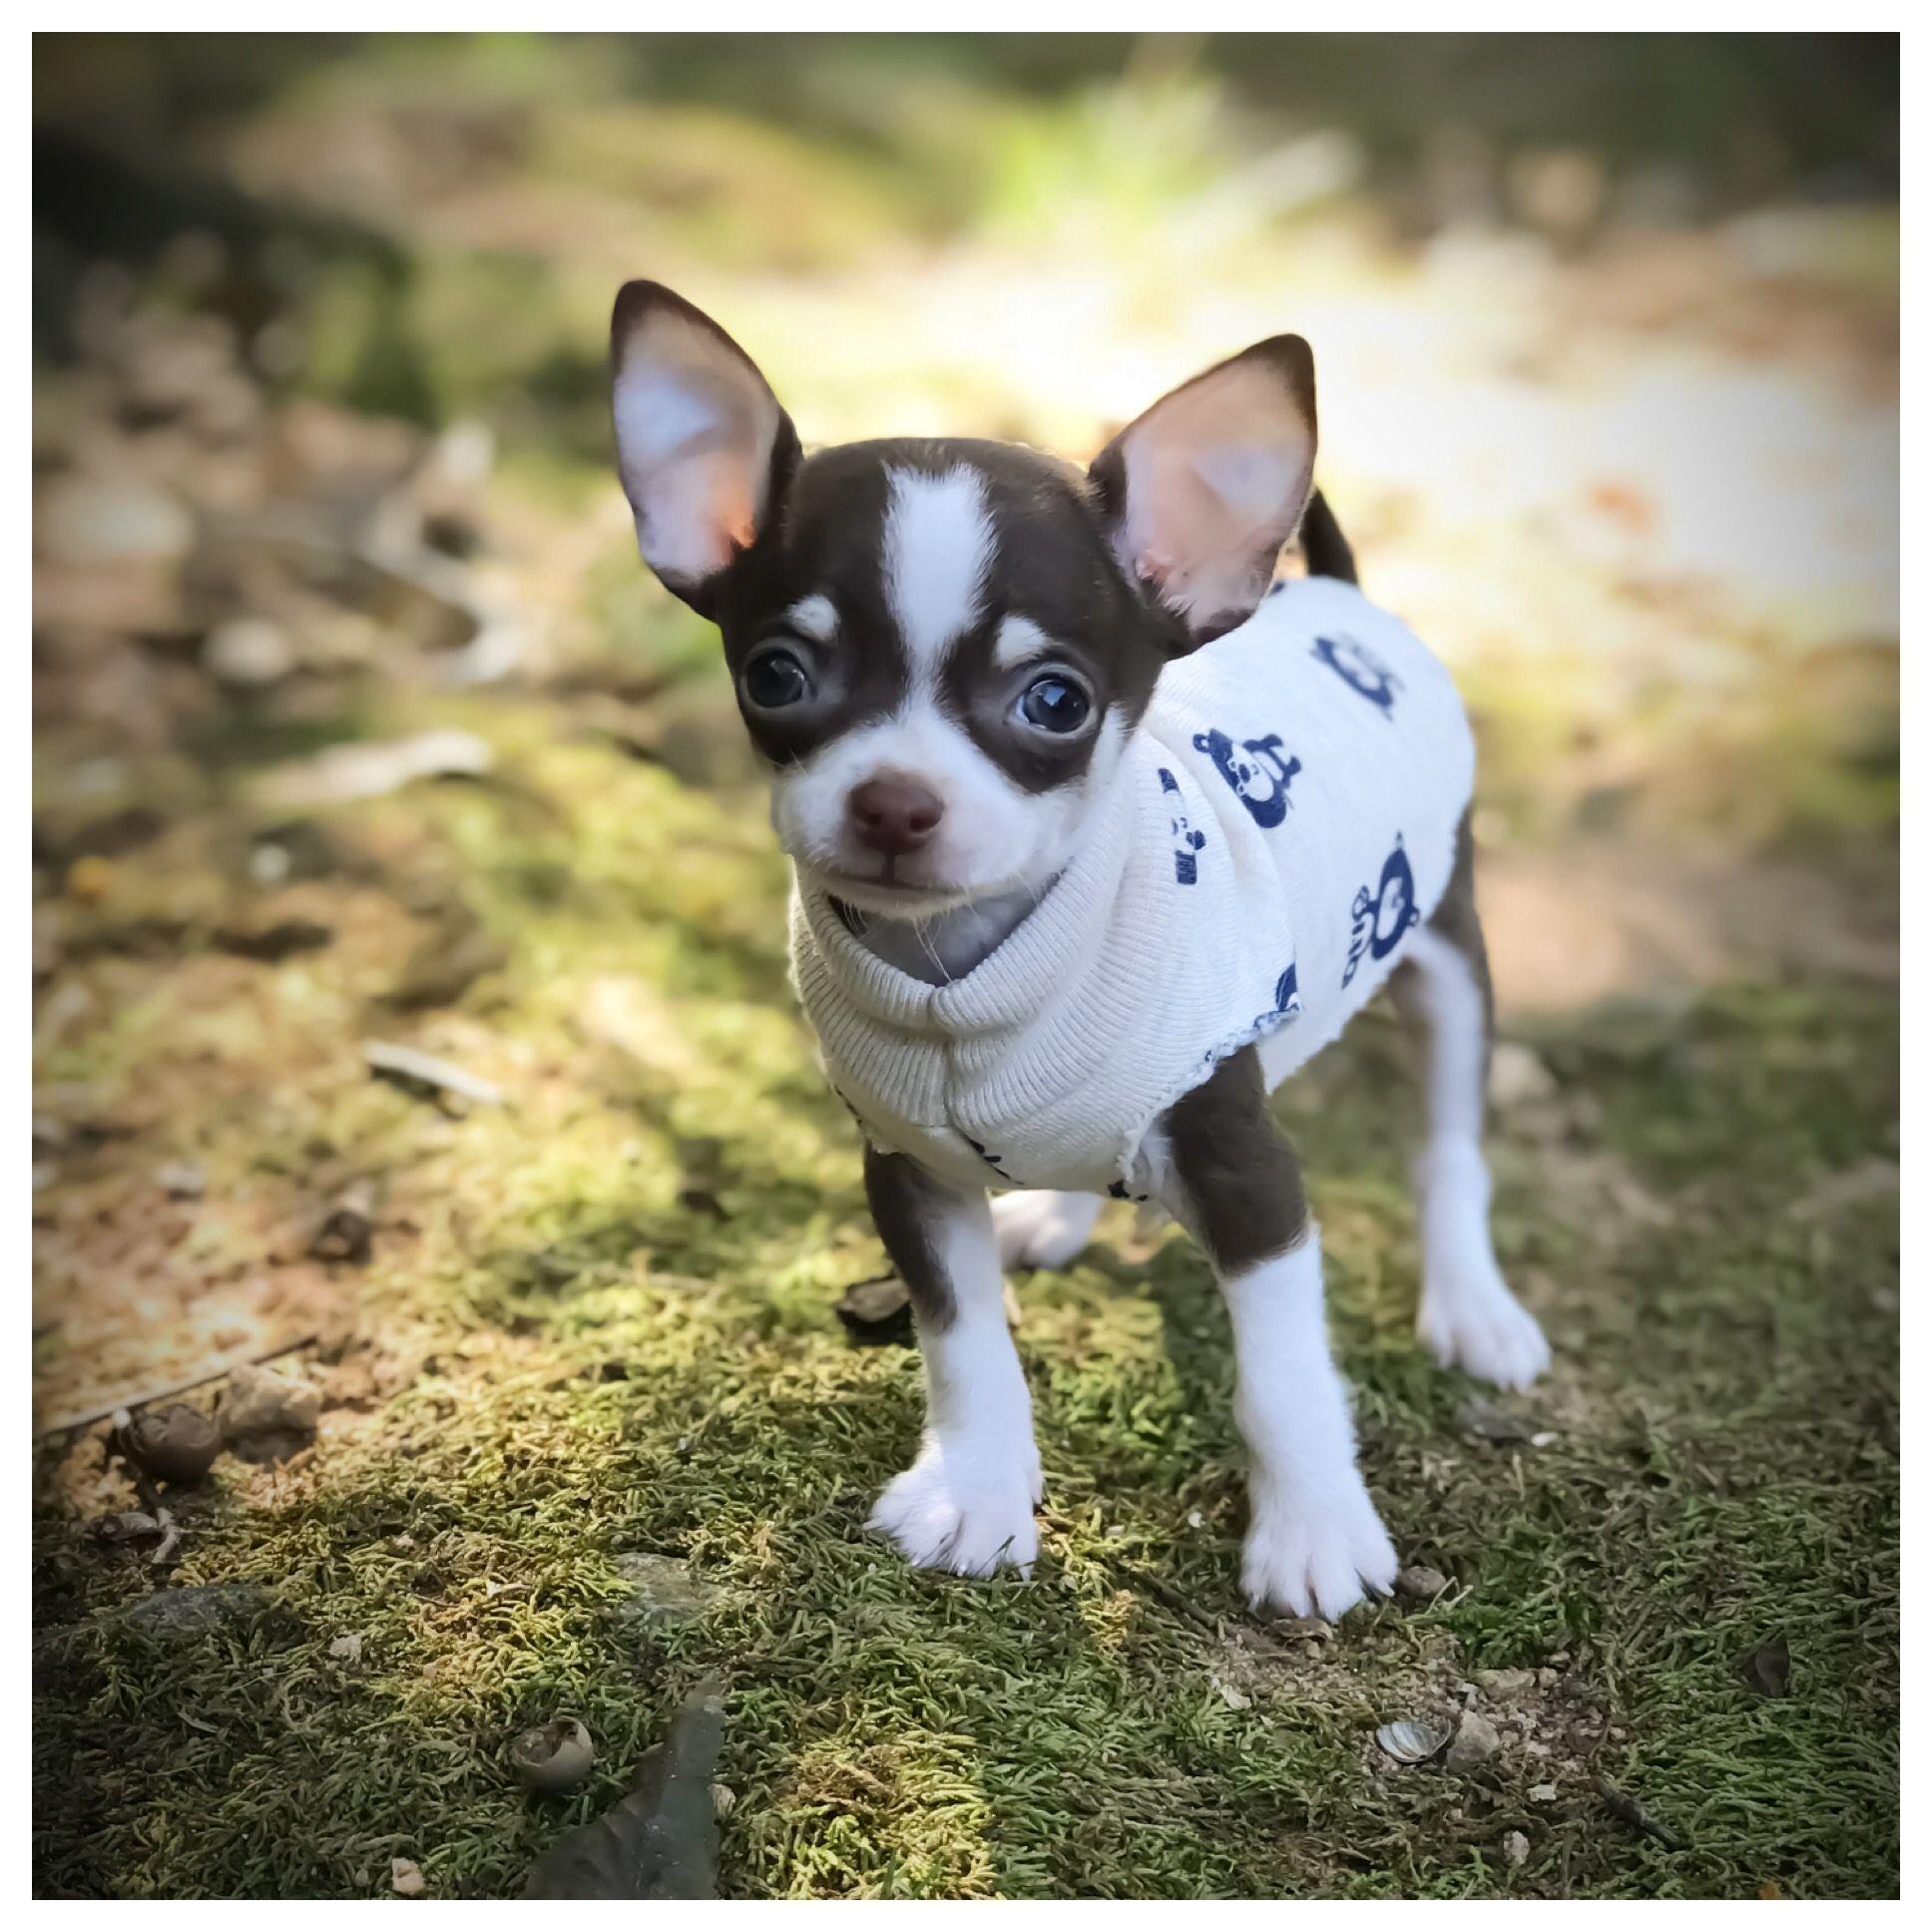 4f465763b0de Cute chihuahua staying warm in a sweater #Chihuahua | photos I love ...